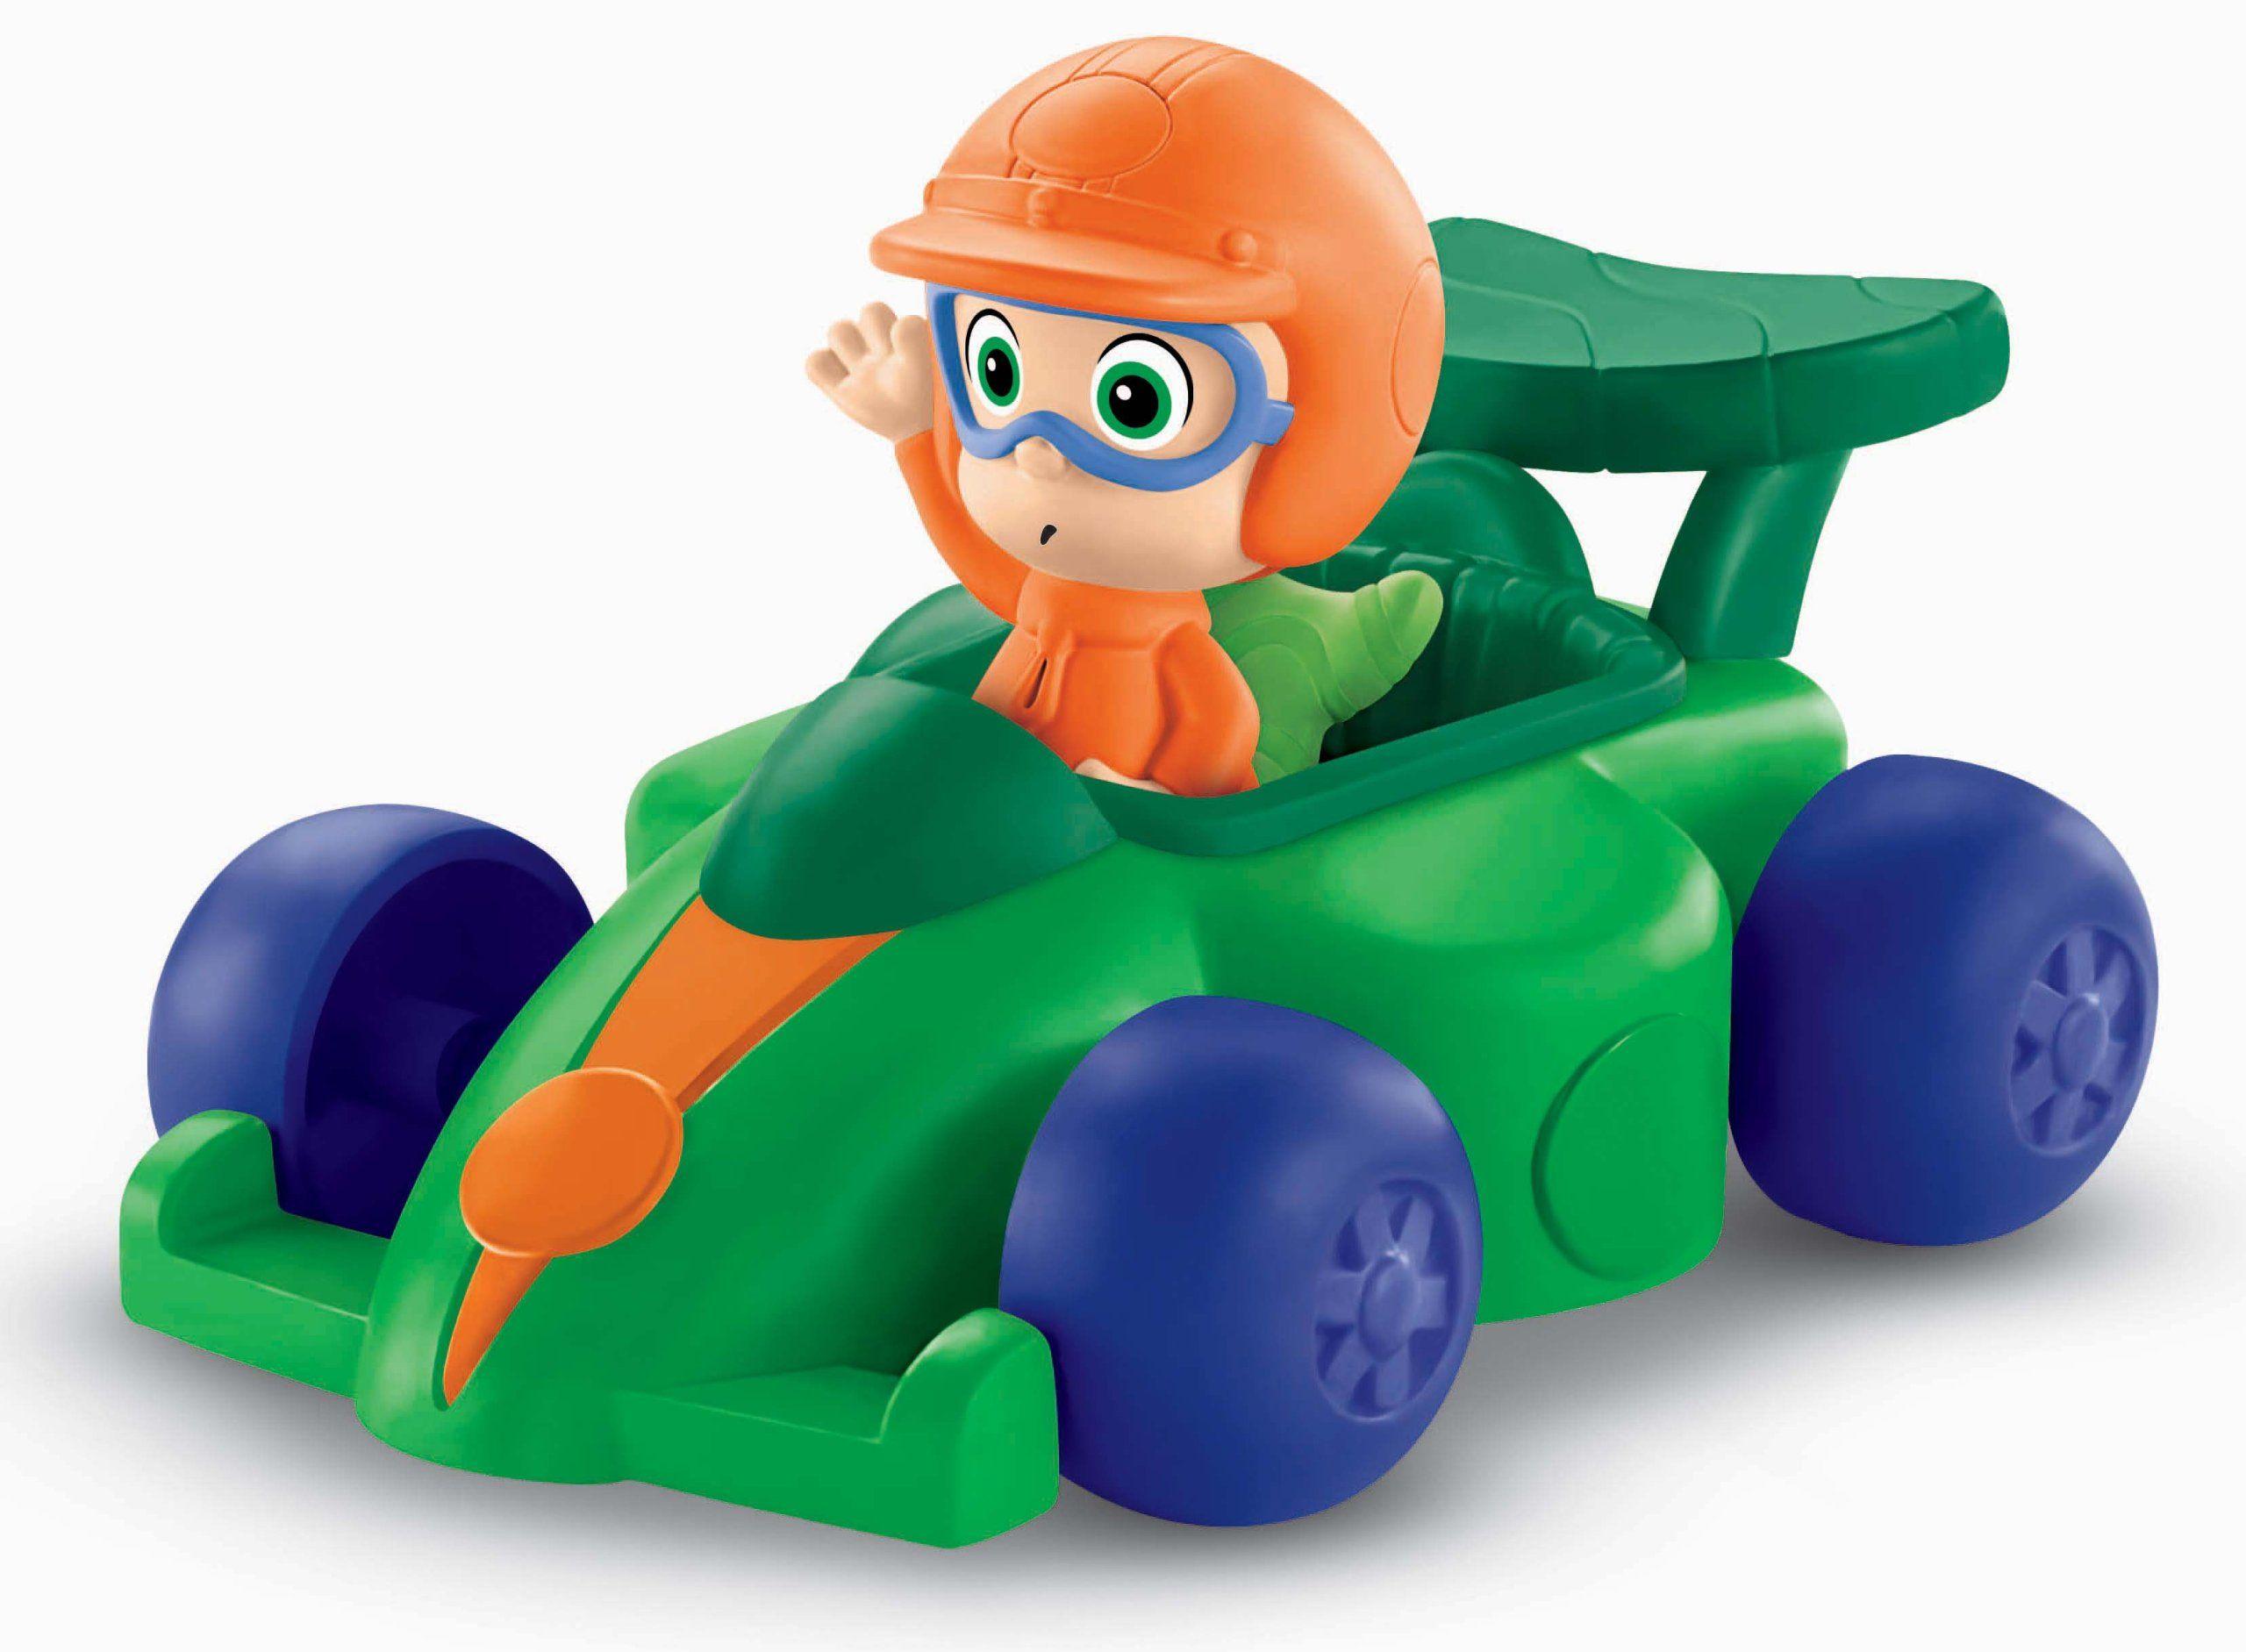 FisherPrice Nickelodeon Bubble Guppies Nonny & Green